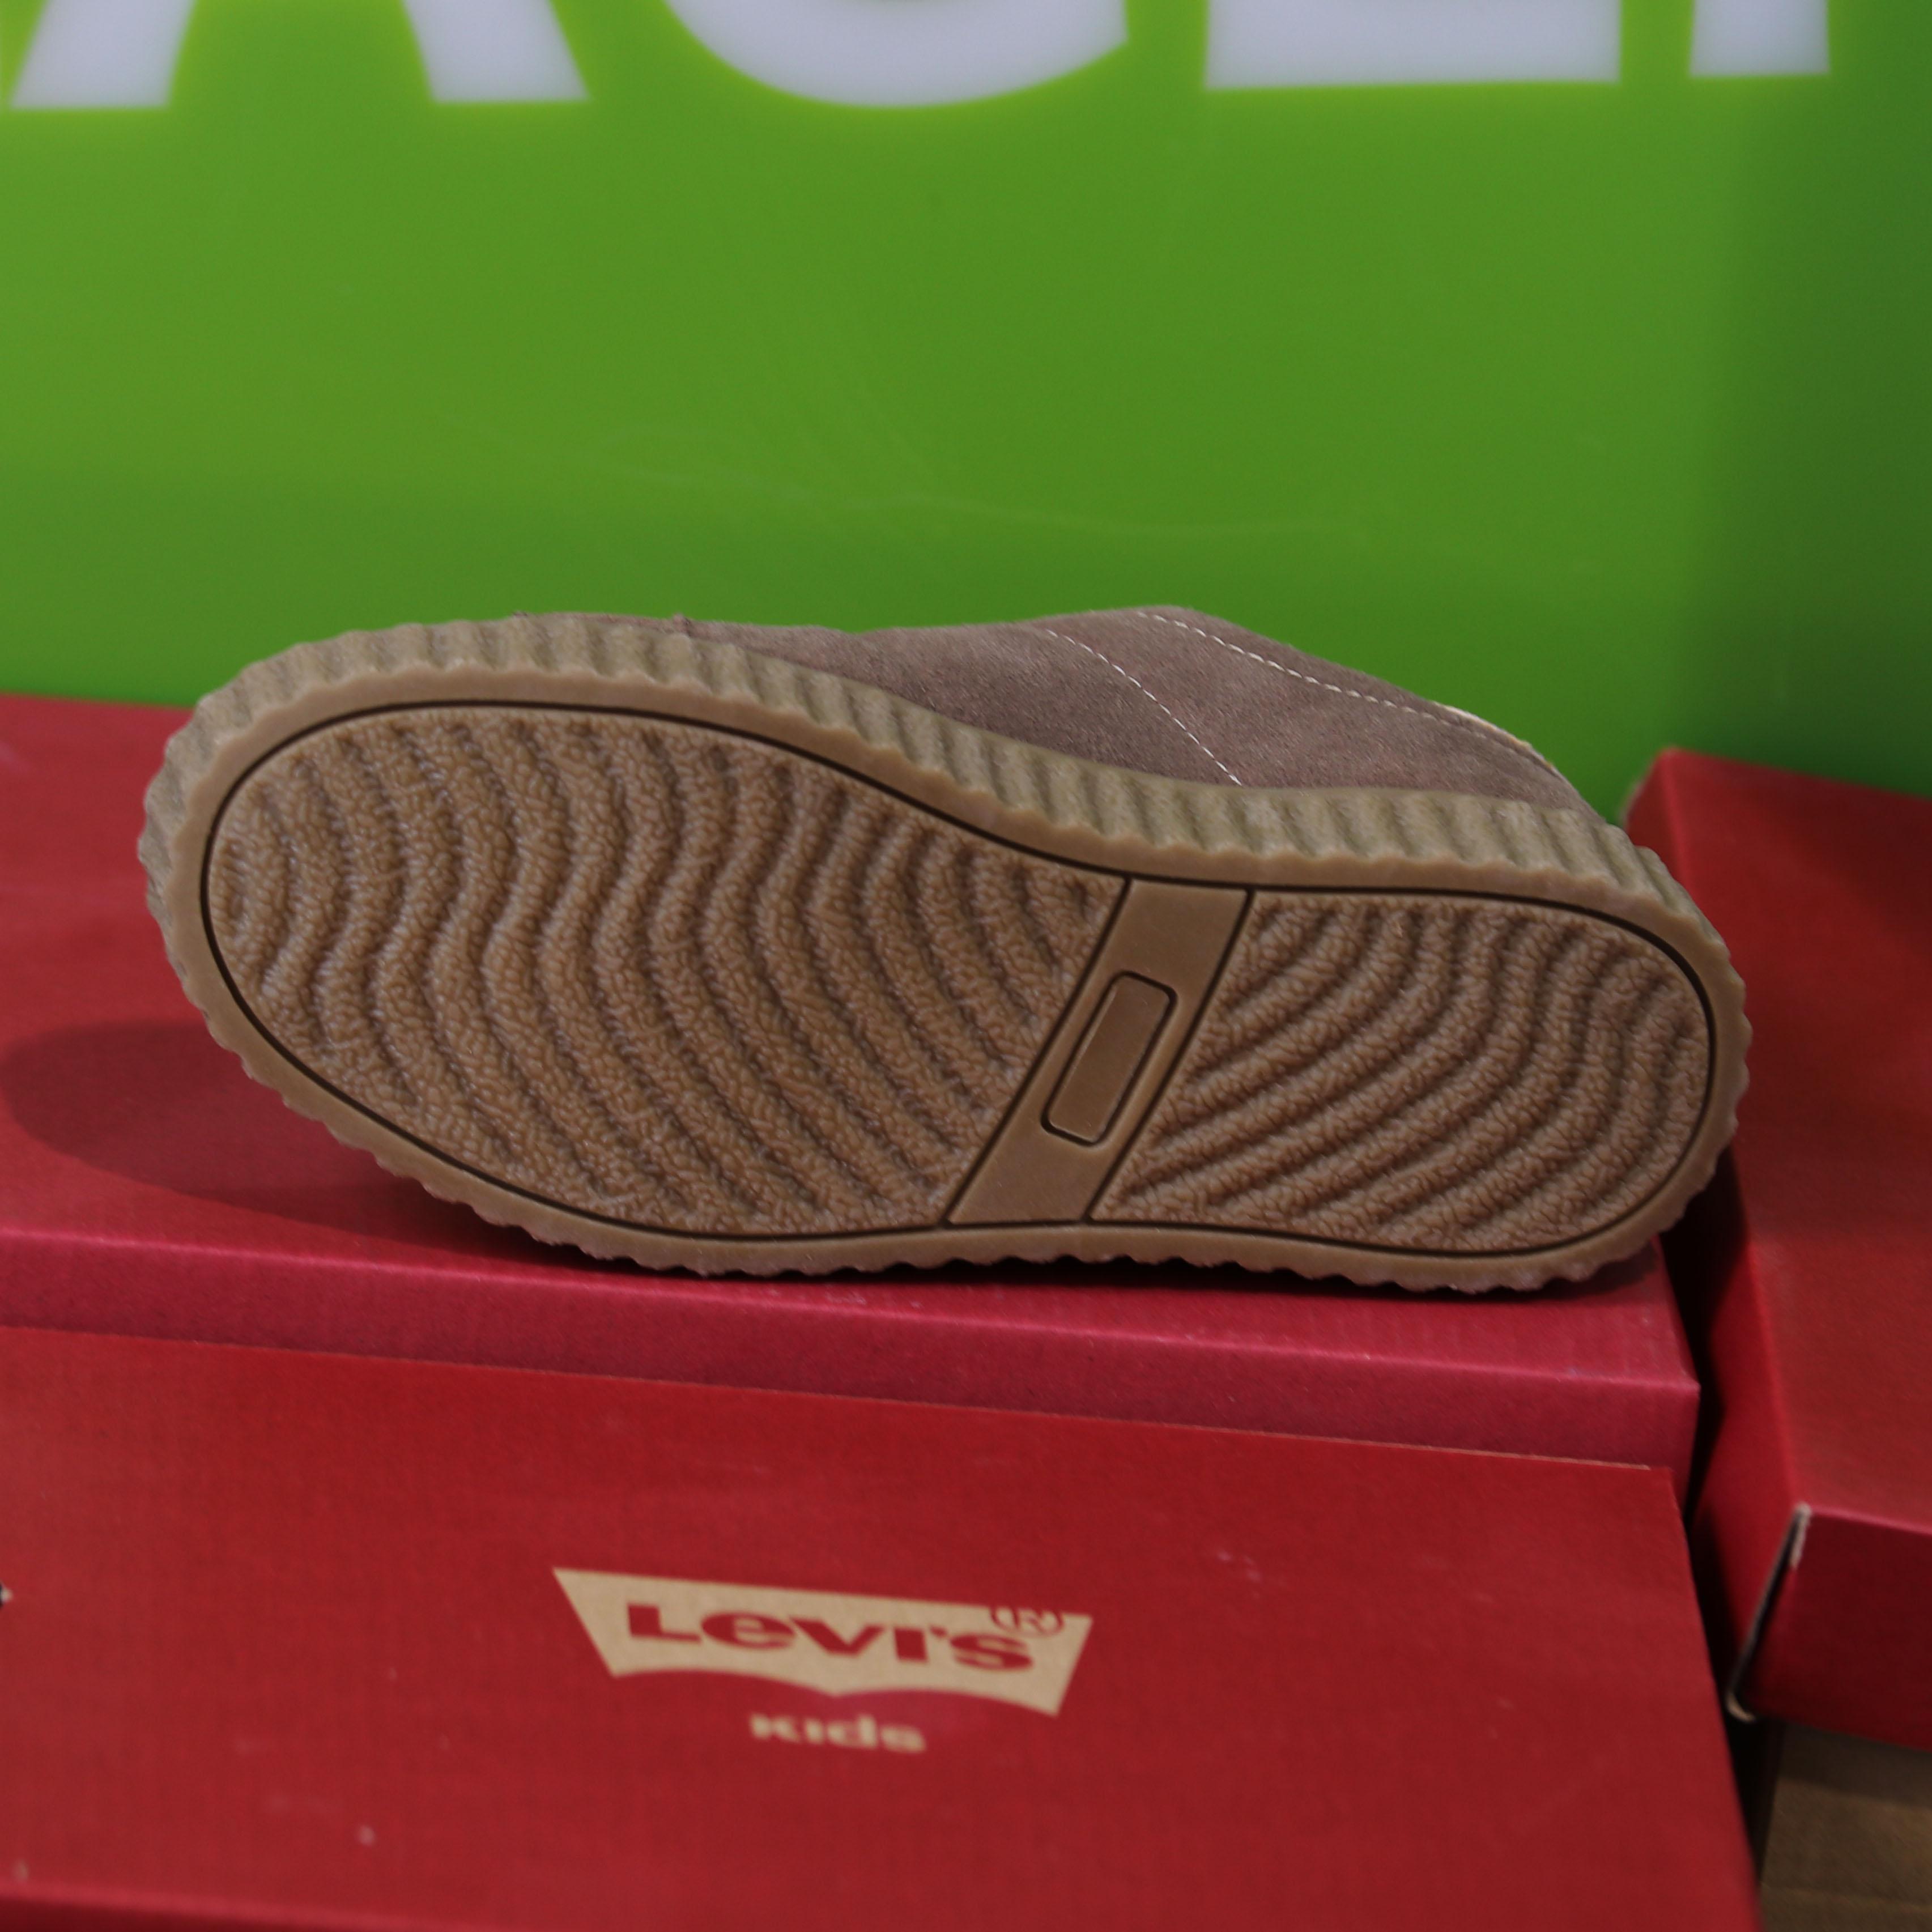 levis kids – new england brun sko barn dame sneakers5